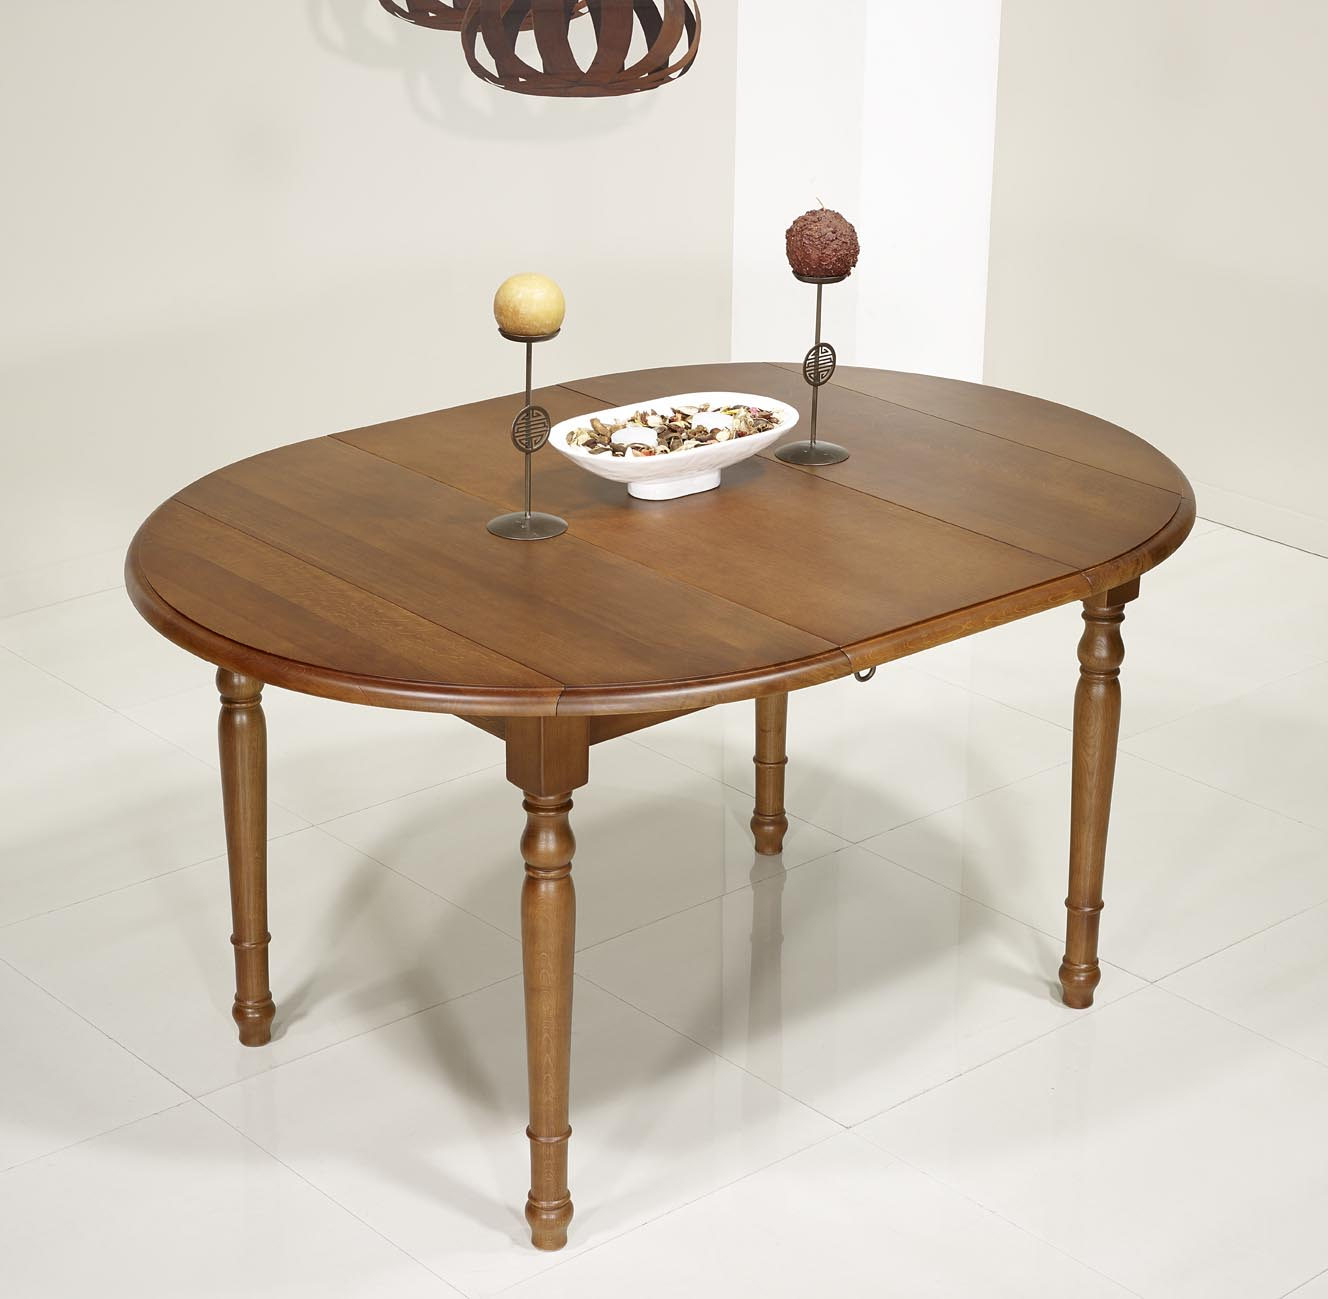 Table ronde volets en ch ne massif de style louis - Table ronde style louis philippe ...